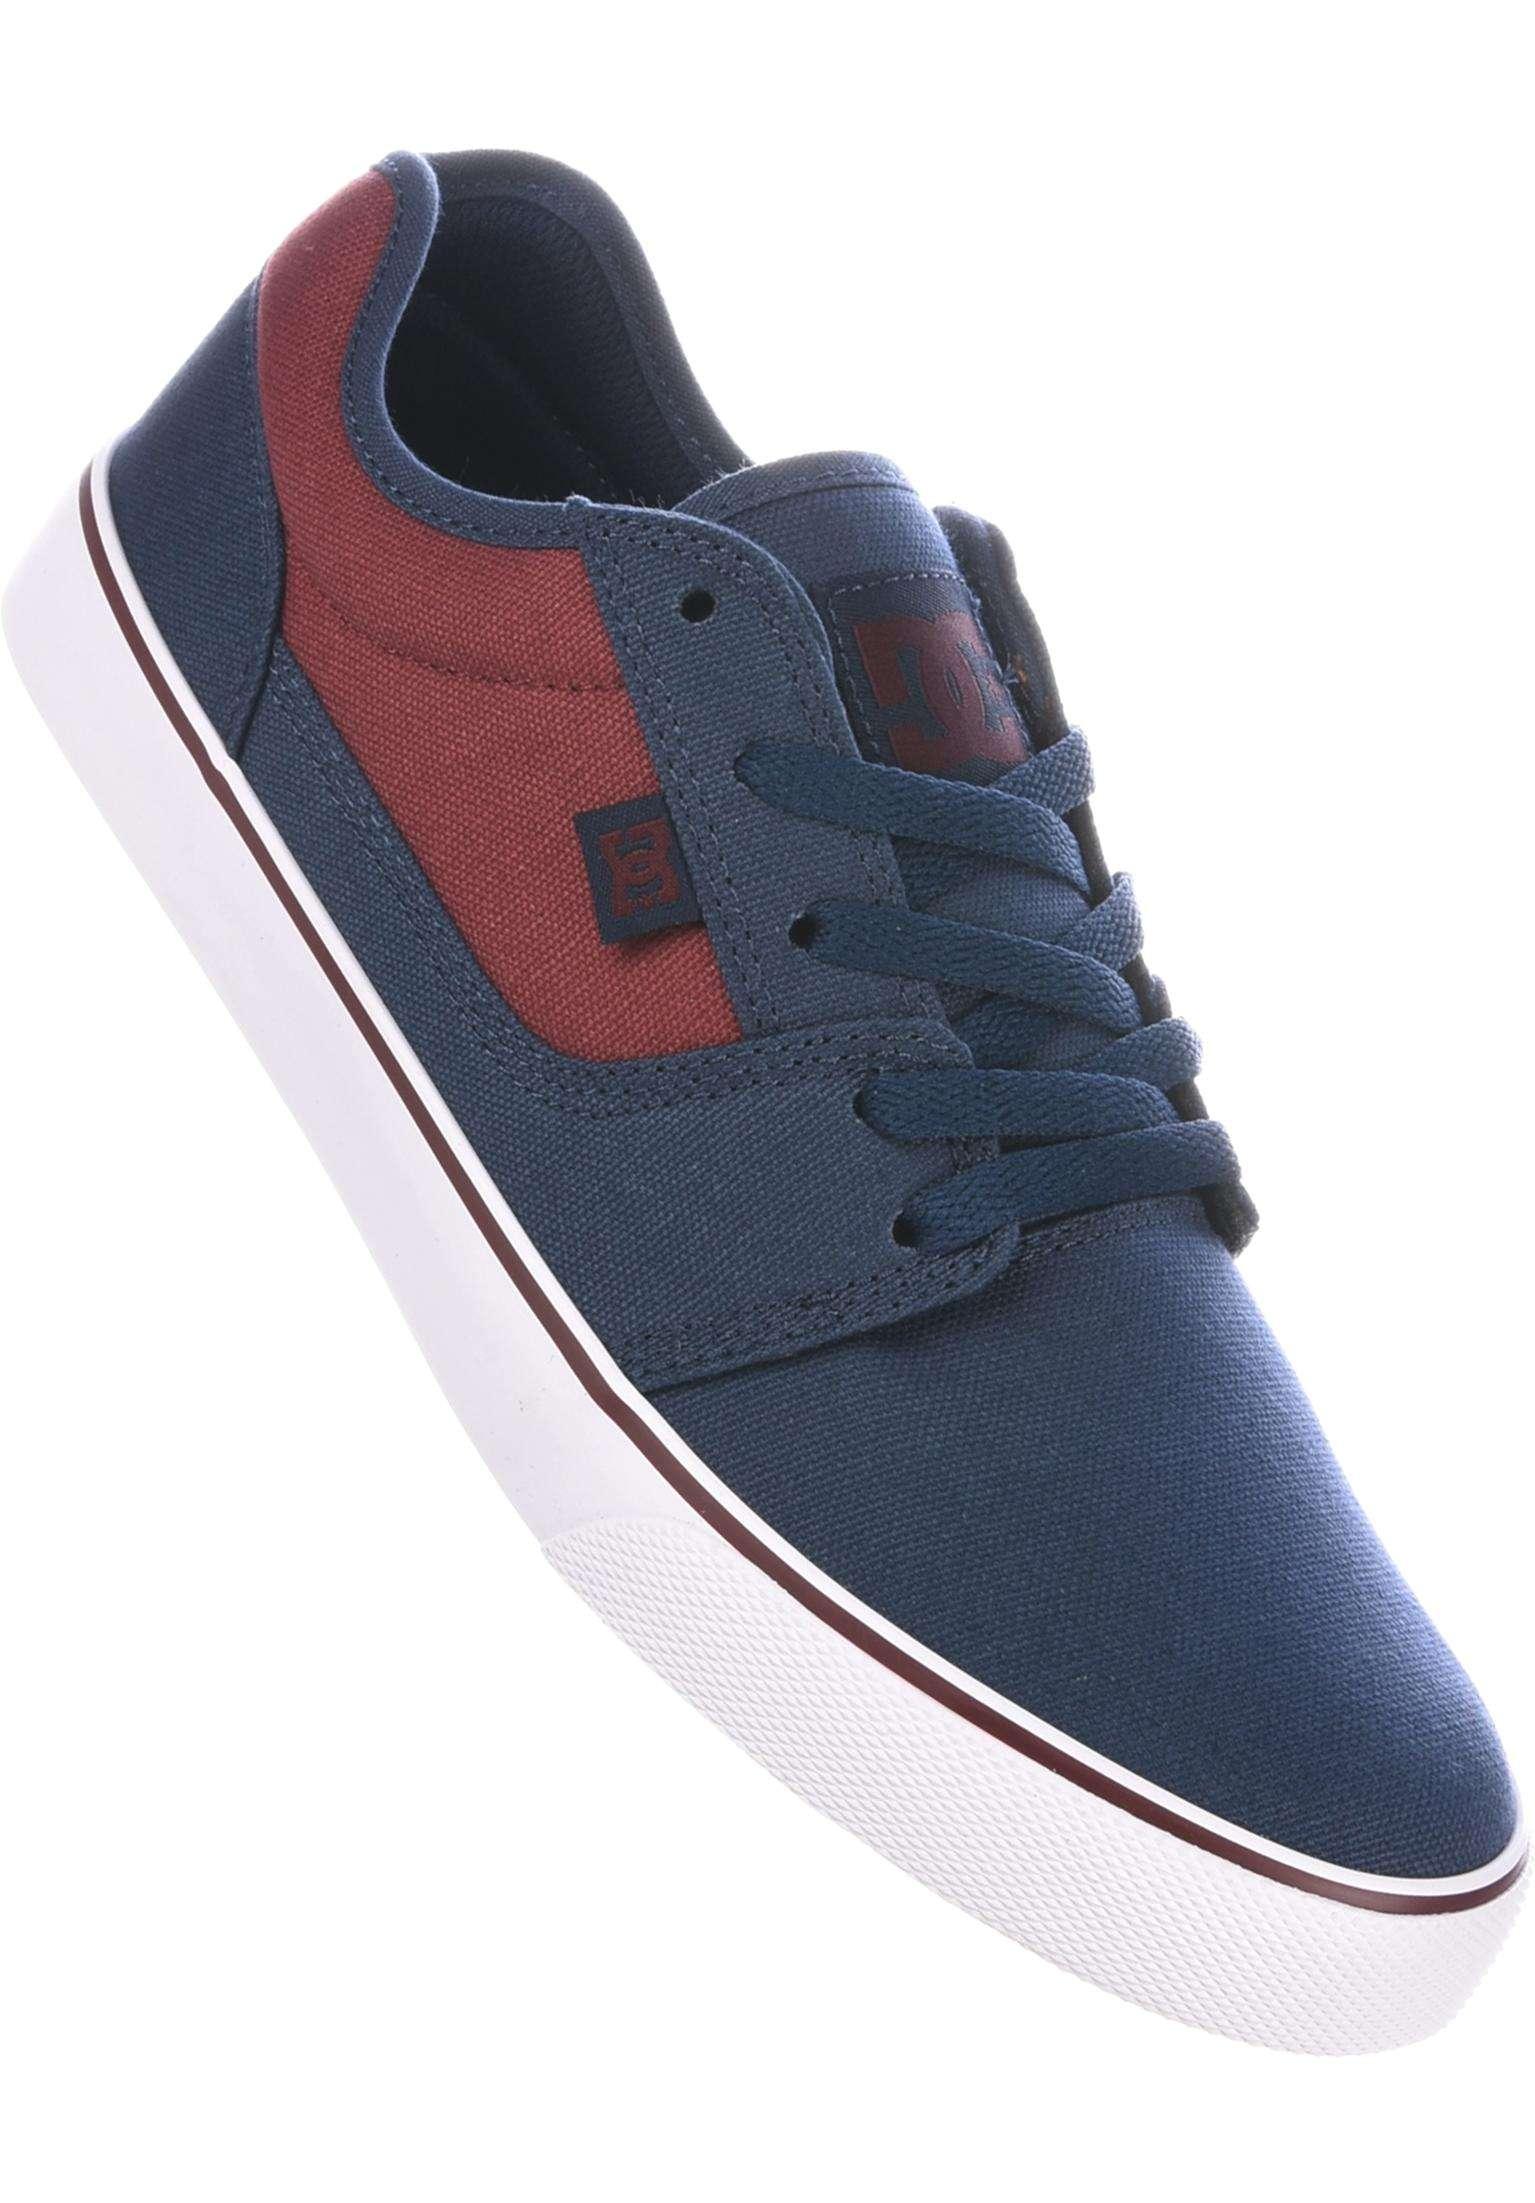 4b4e82c0b3b42 Tonik TX DC Shoes All Shoes in navy for Men